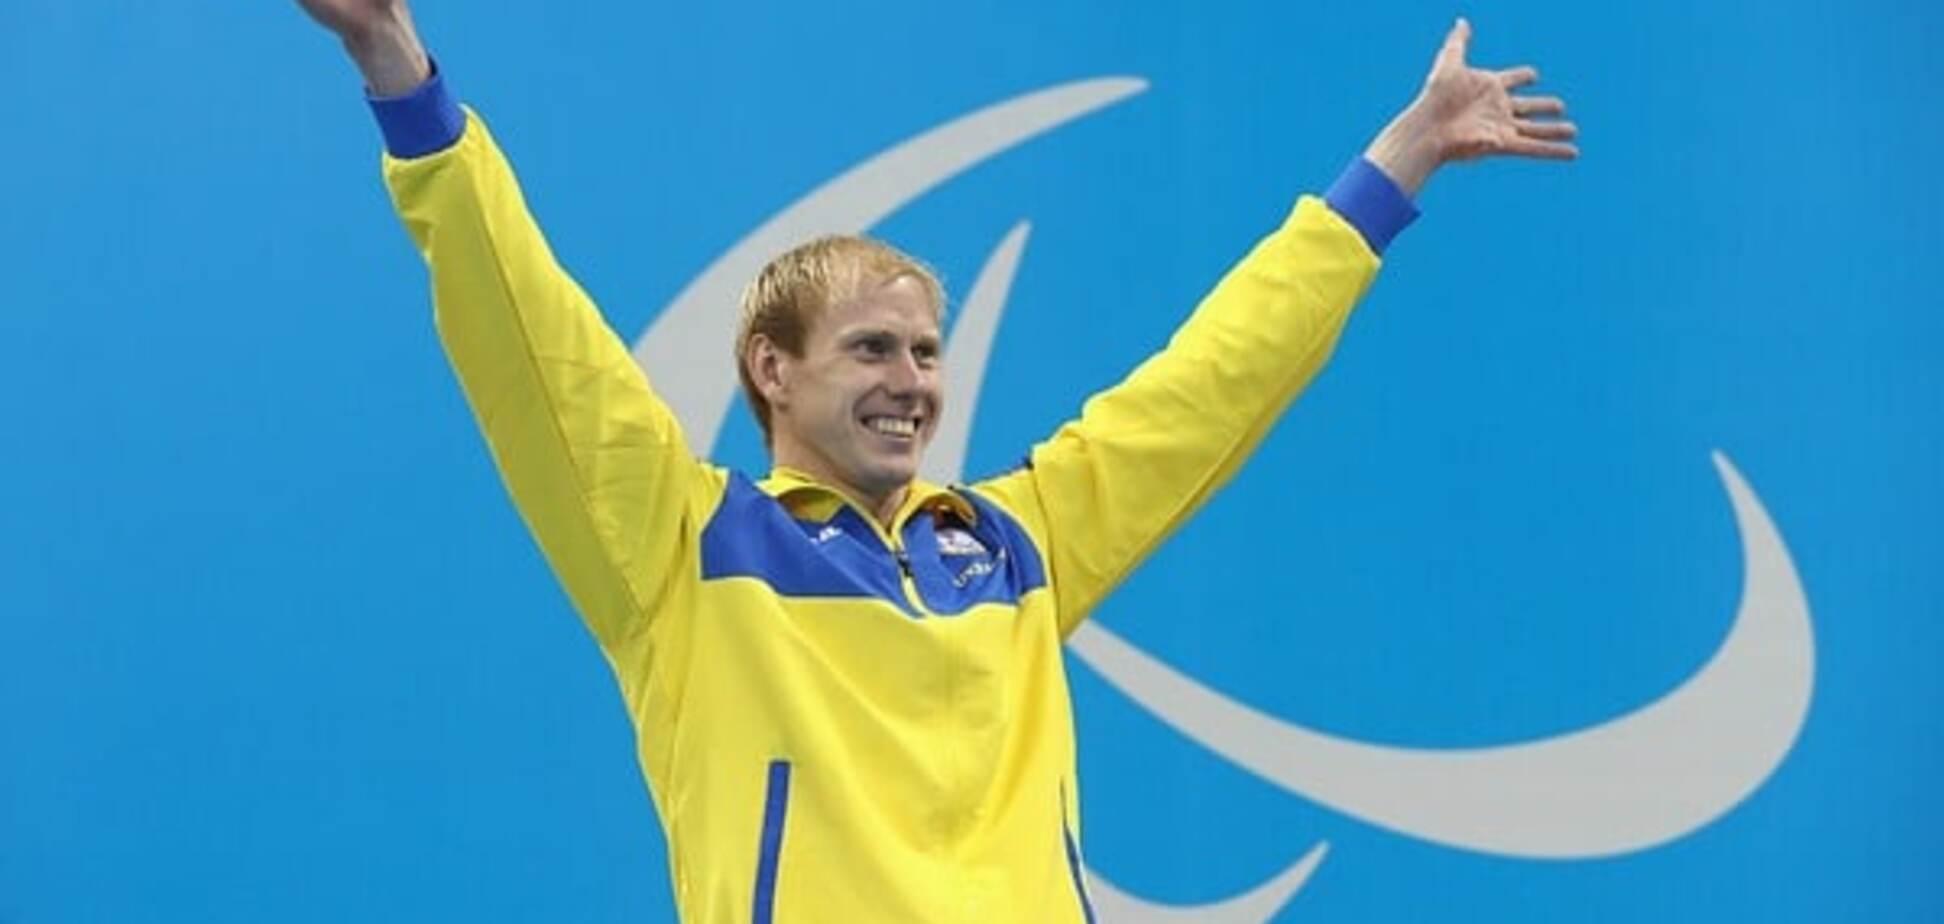 Україна завоювала 11 медалей у передостанній день Паралімпіади-2016